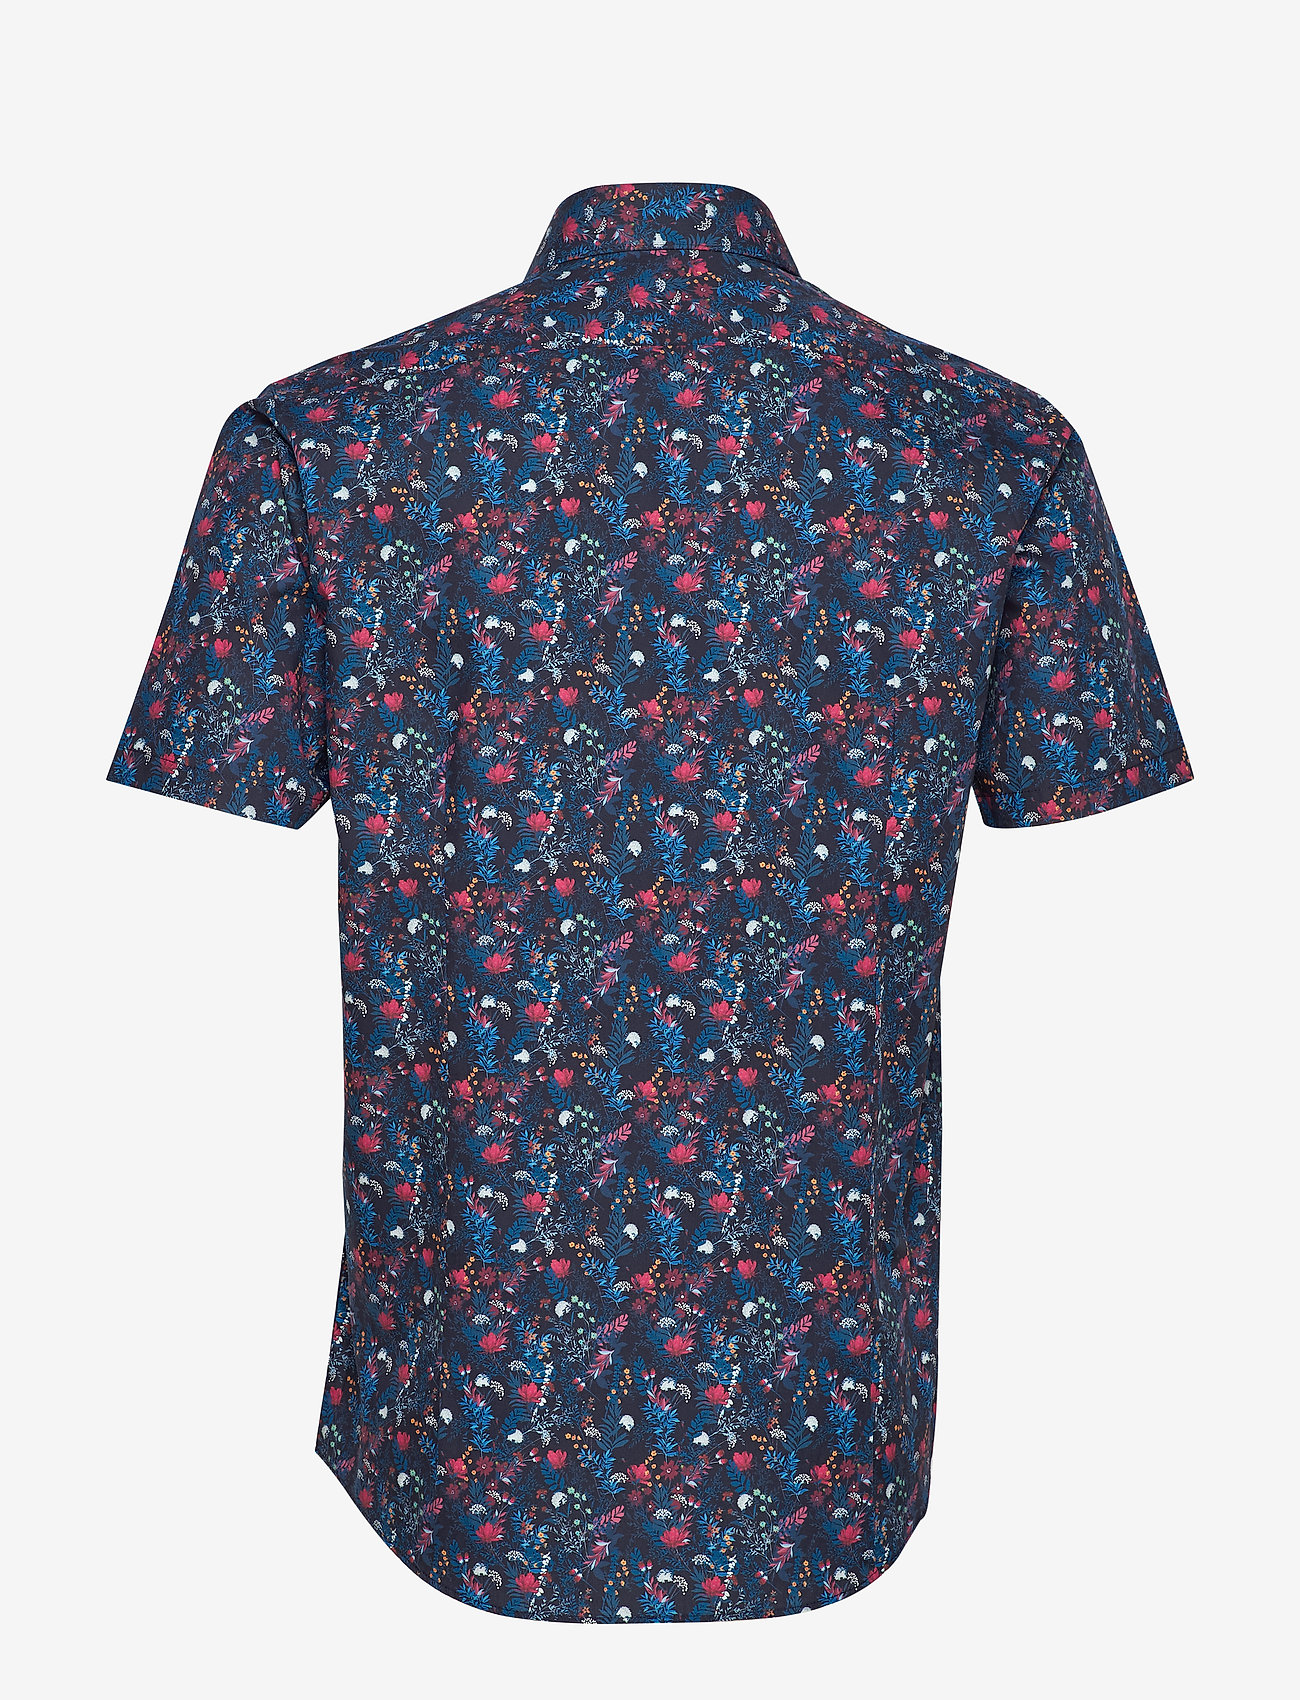 Aop Cotton Shirt S/s (Blue) (39.98 €) - Lindbergh RdWww